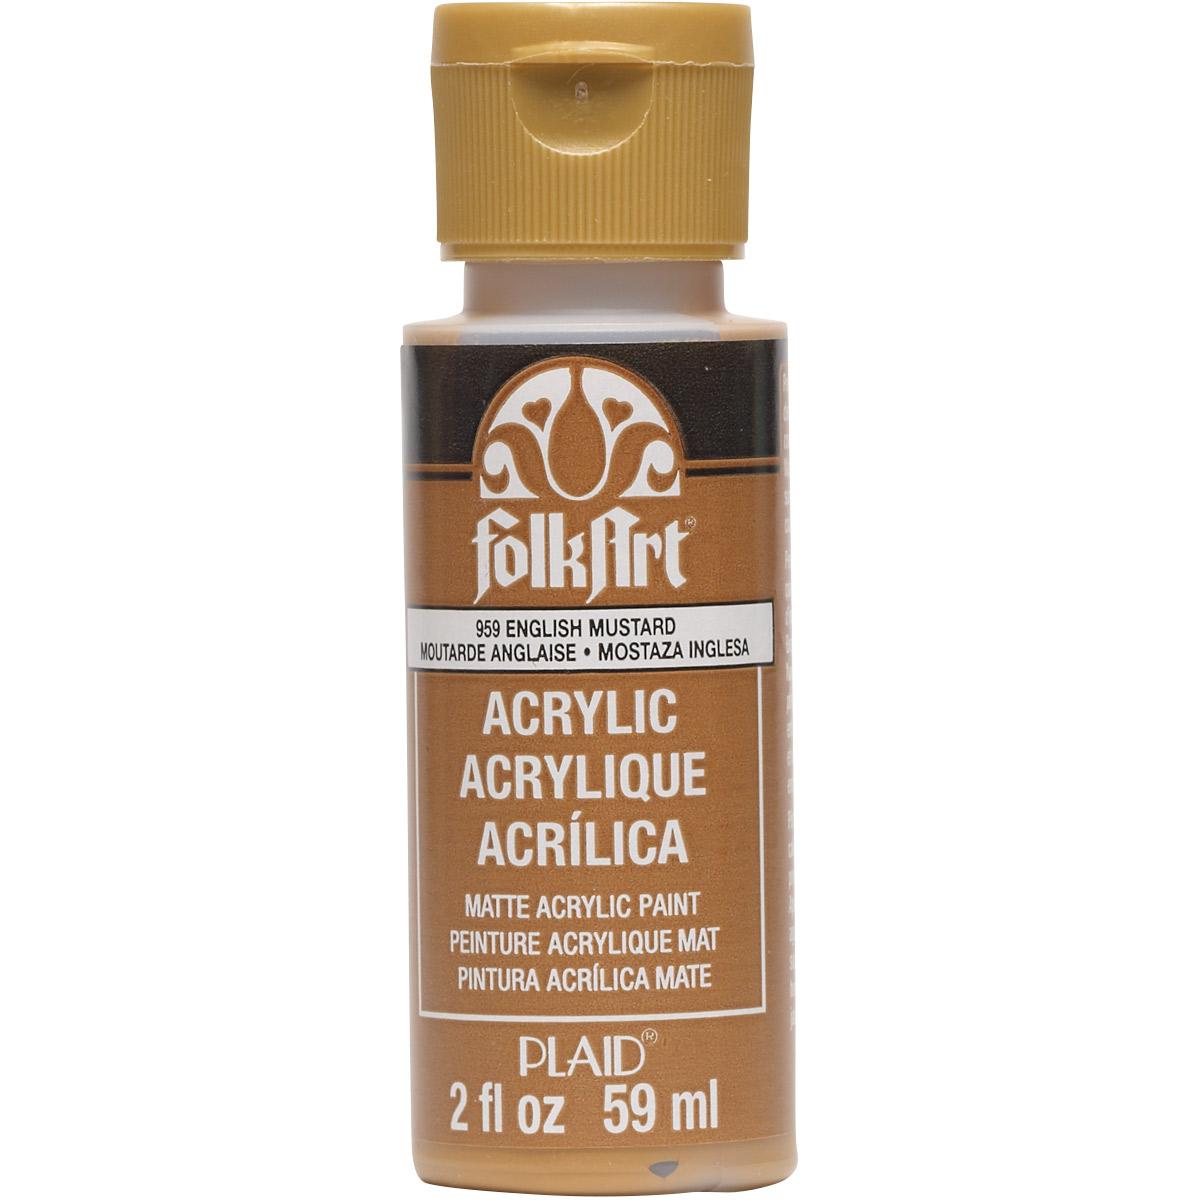 FolkArt ® Acrylic Colors - English Mustard, 2 oz.